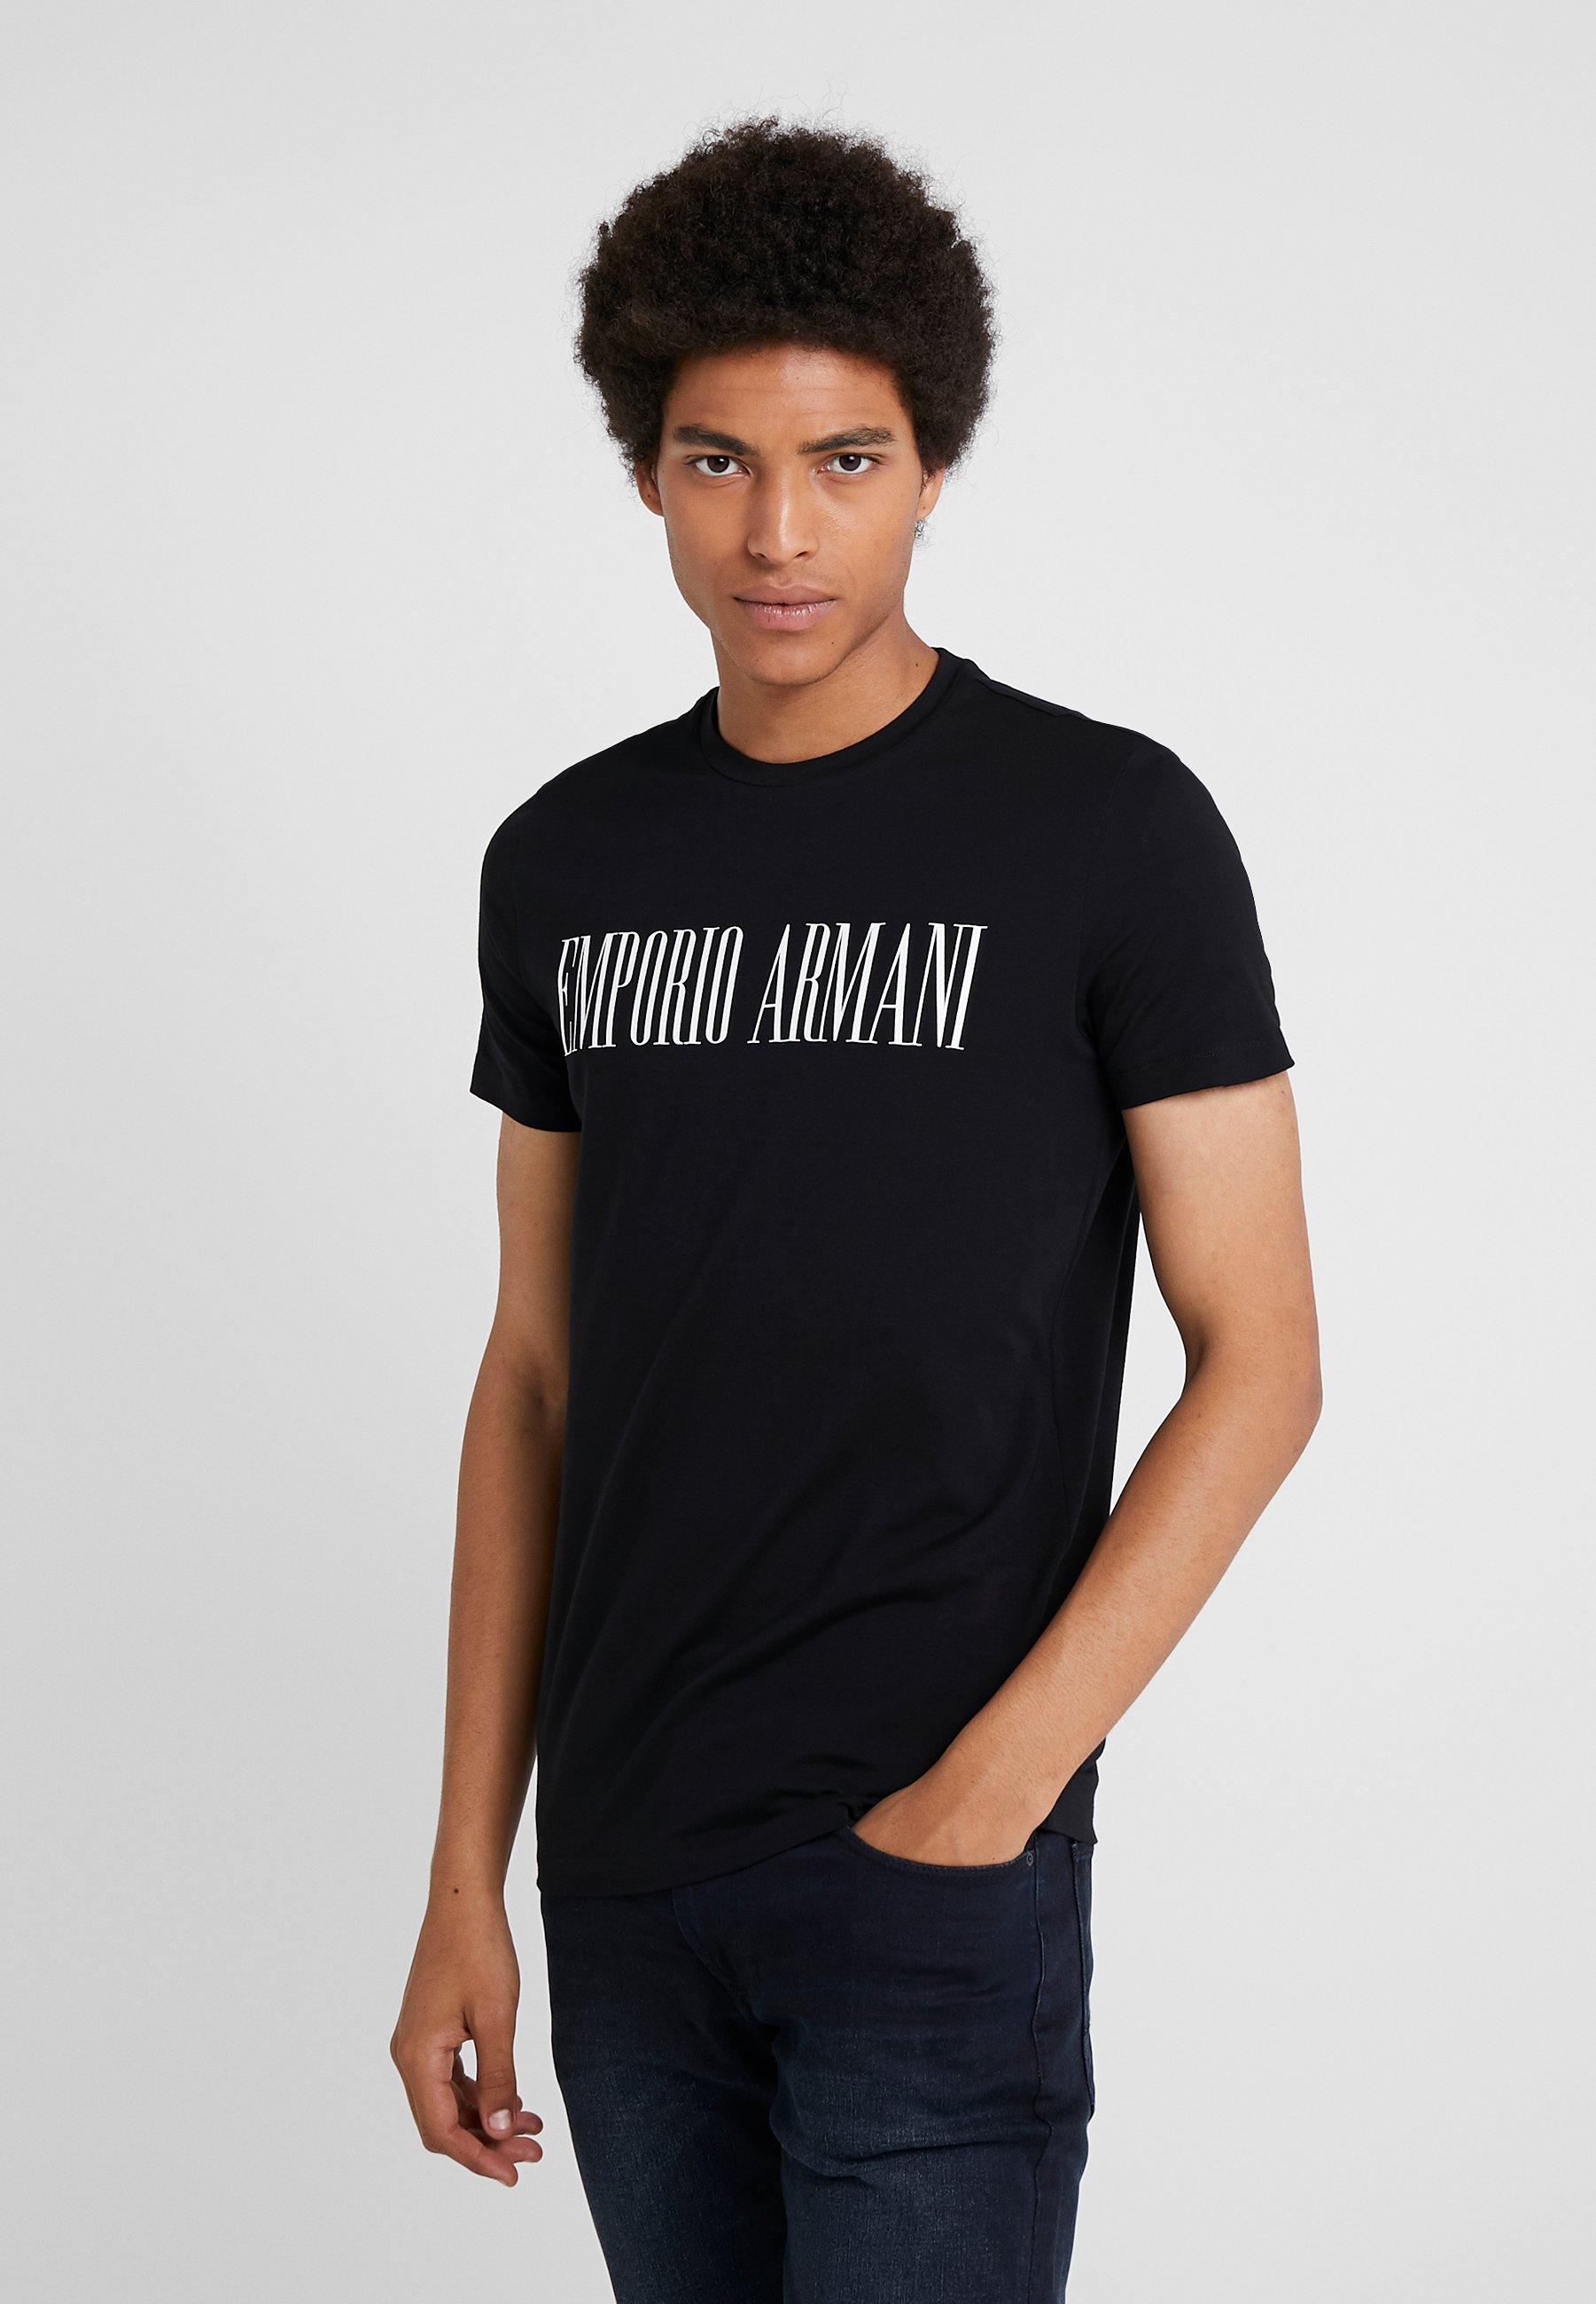 shirt Emporio Armani T T ImpriméNero ImpriméNero Emporio shirt Emporio Armani Armani nOPkX8w0